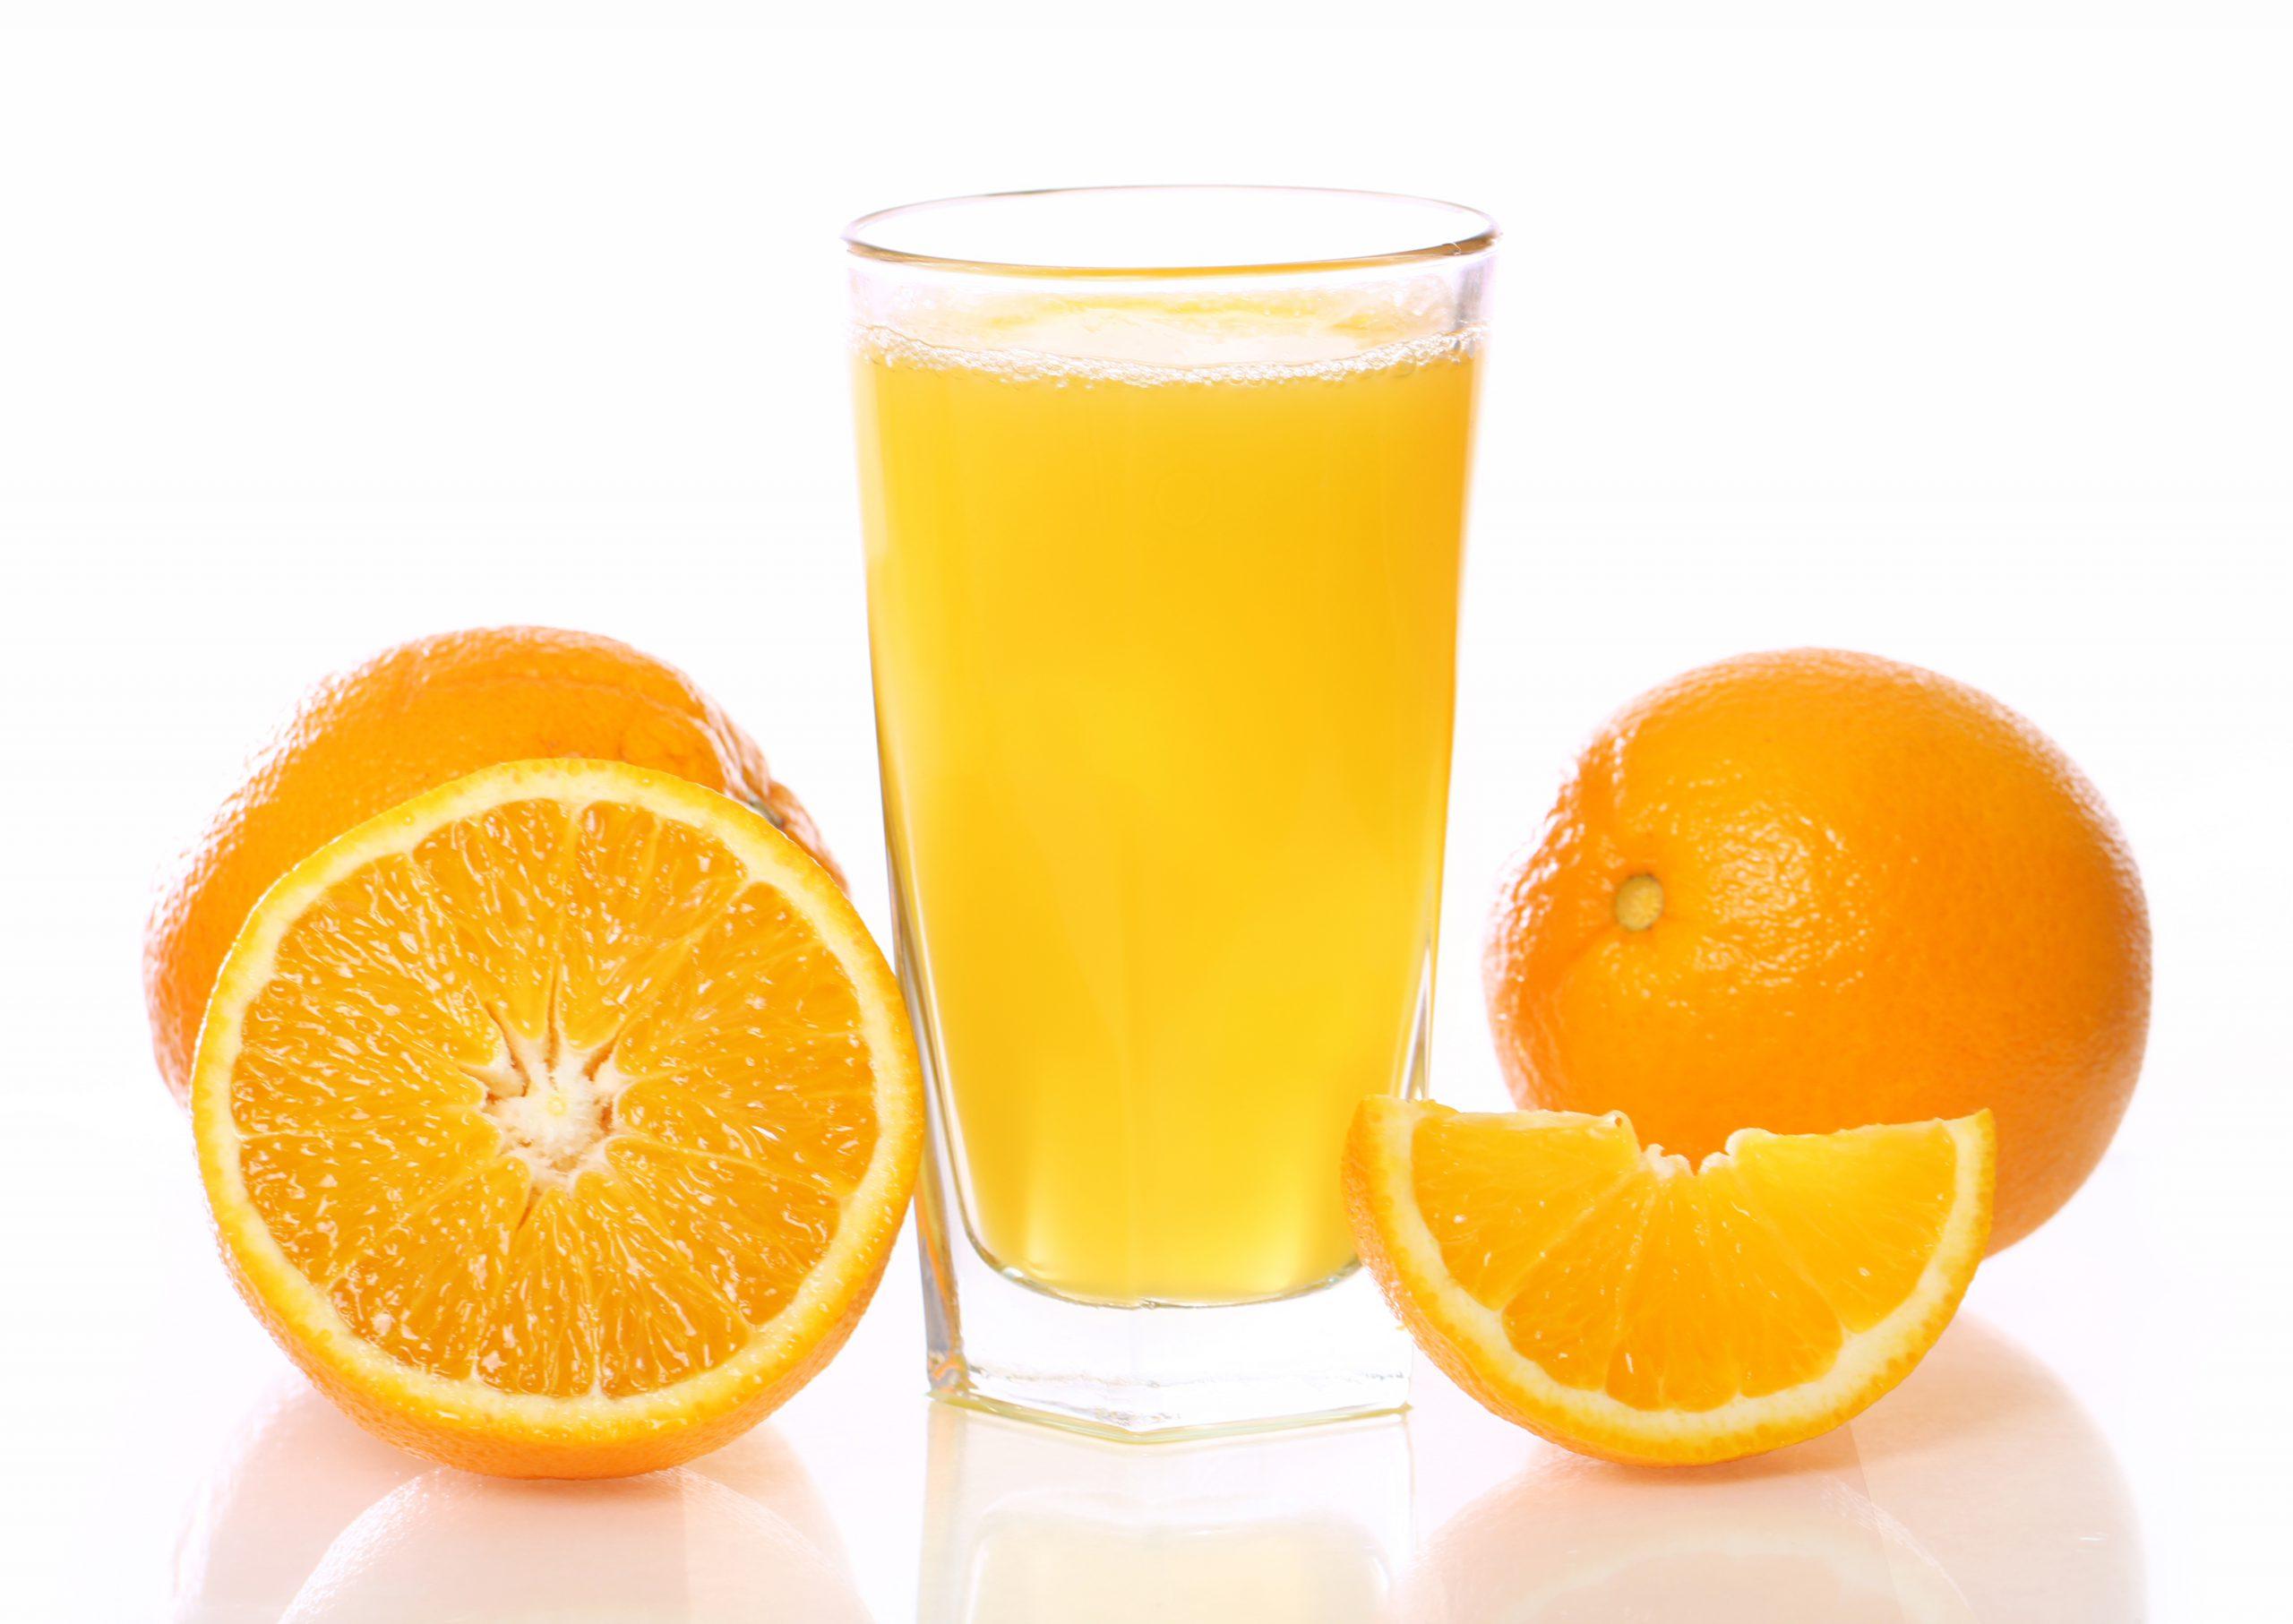 شربت ویتامین ث ، وبتالند ، شربت ویتامین ث ویتالند ، شربت ویتامین C ویتالند ، ویتامین ث 250